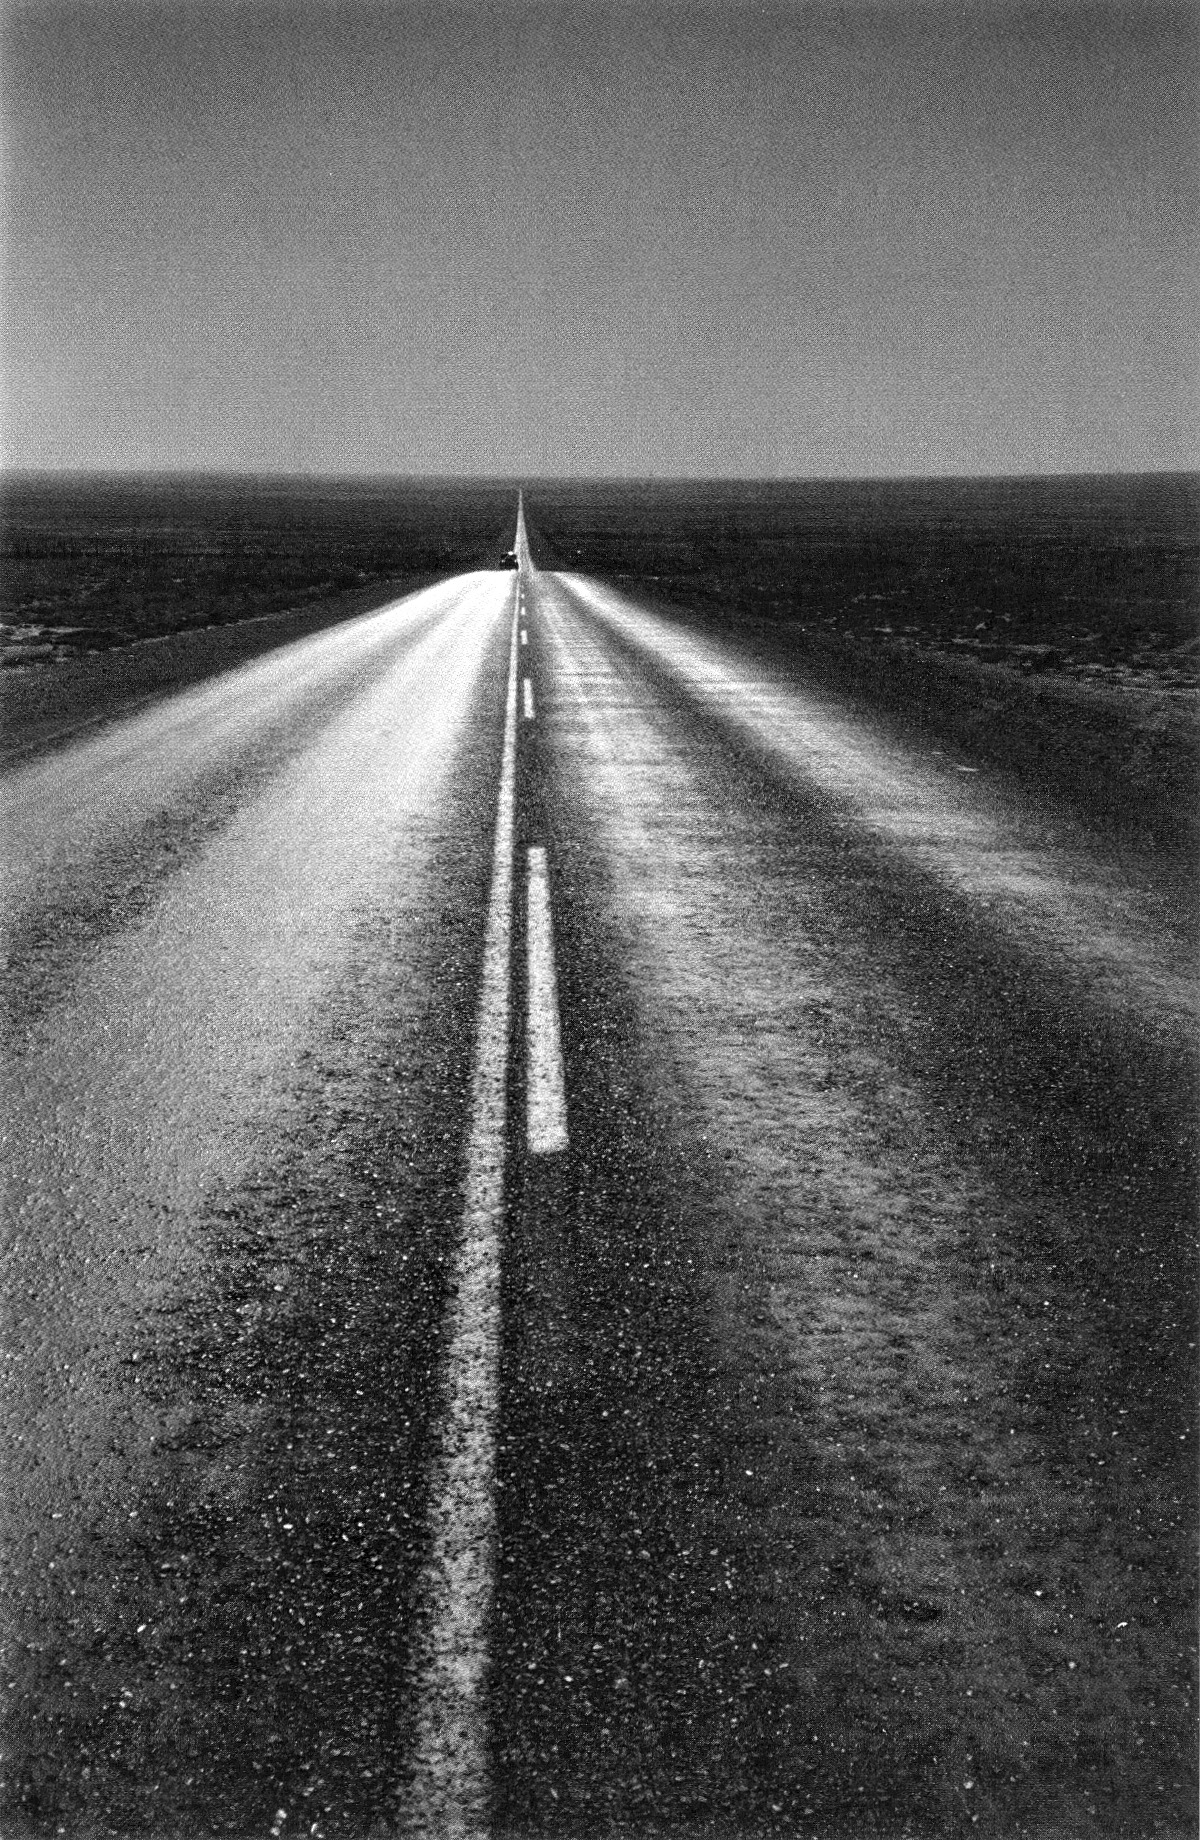 36. U.S. 285, New Mexico 1955